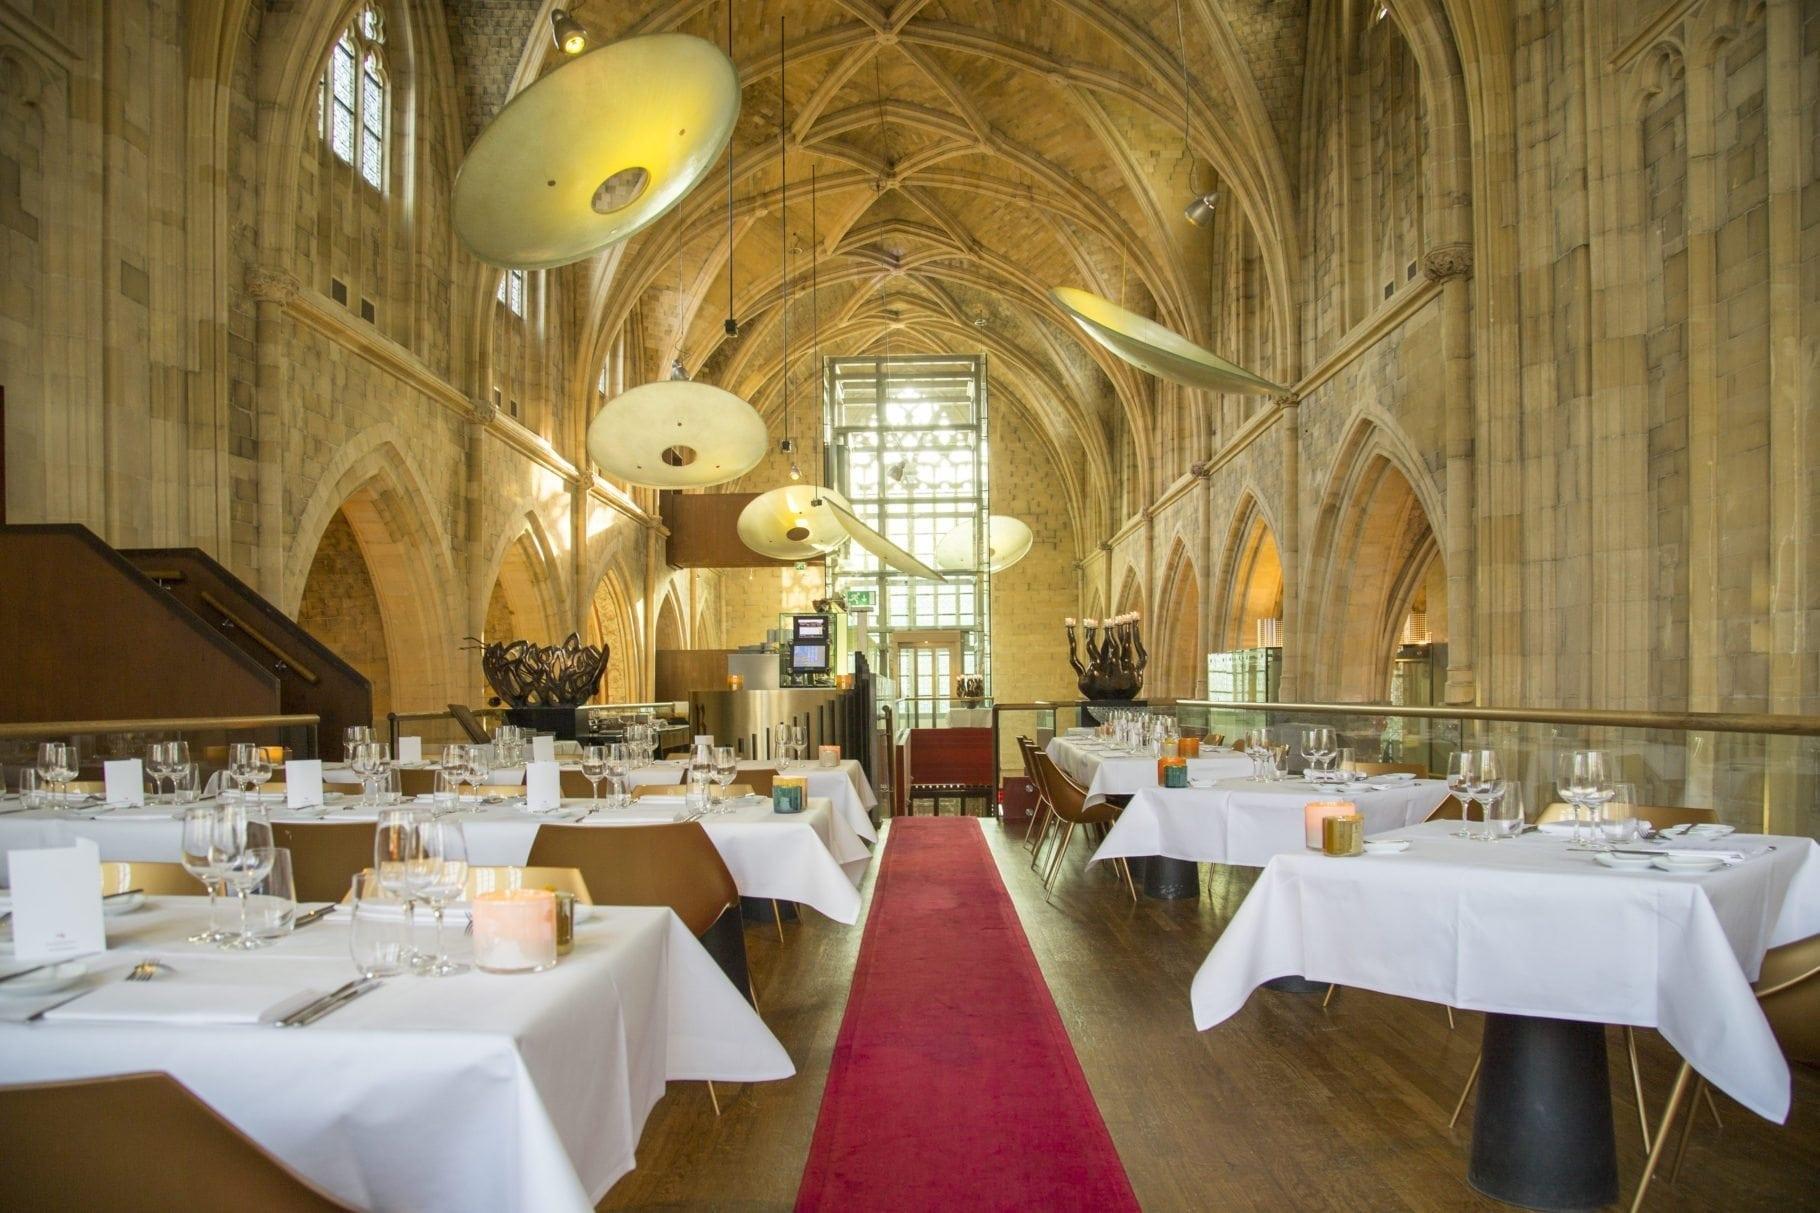 Kruisherenrestaurant Maastricht